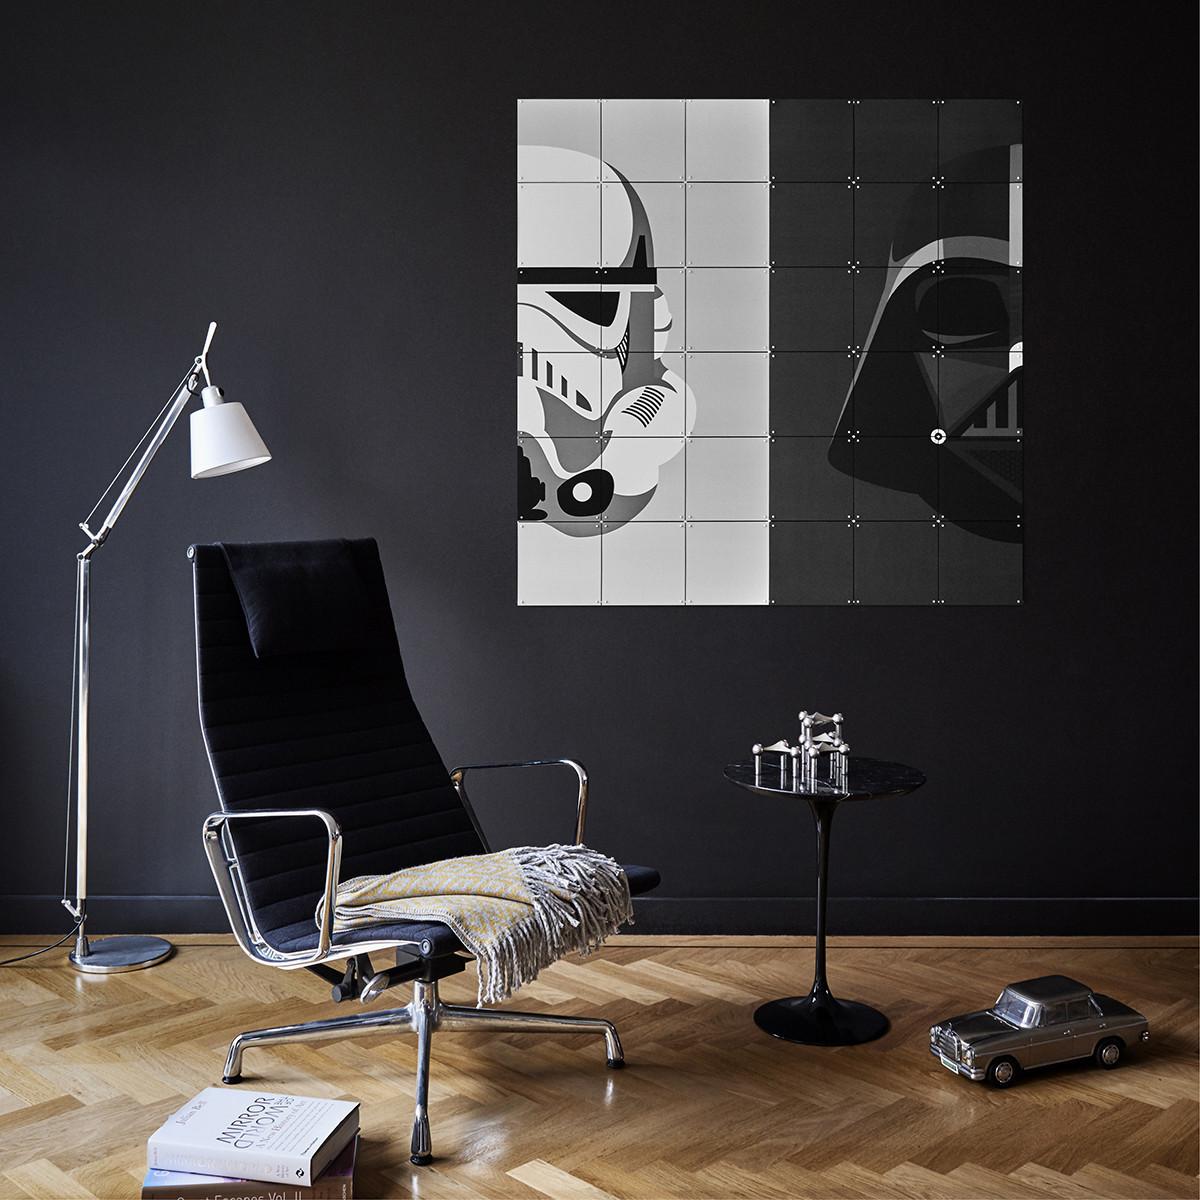 Ixxi: Star Wars Stormtrooper / Darth Vader Wall Art (120cm X 120cm) image